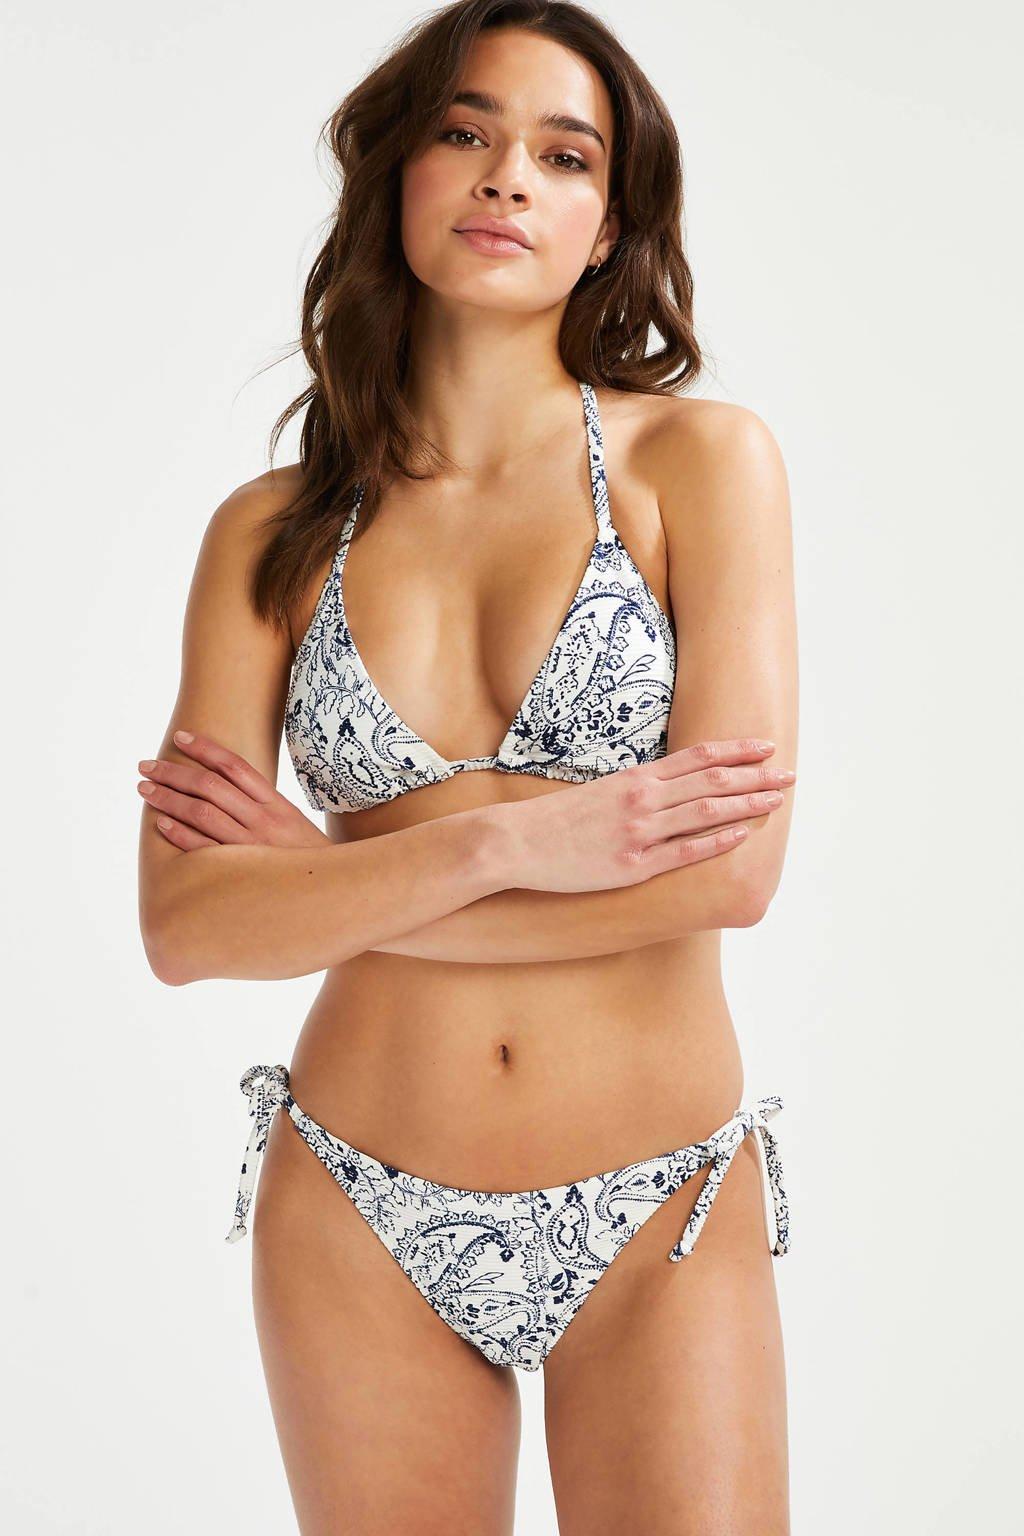 Hunkemöller strik bikinibroekje met all over print wit/donkerblauw, Wit/donkerblauw